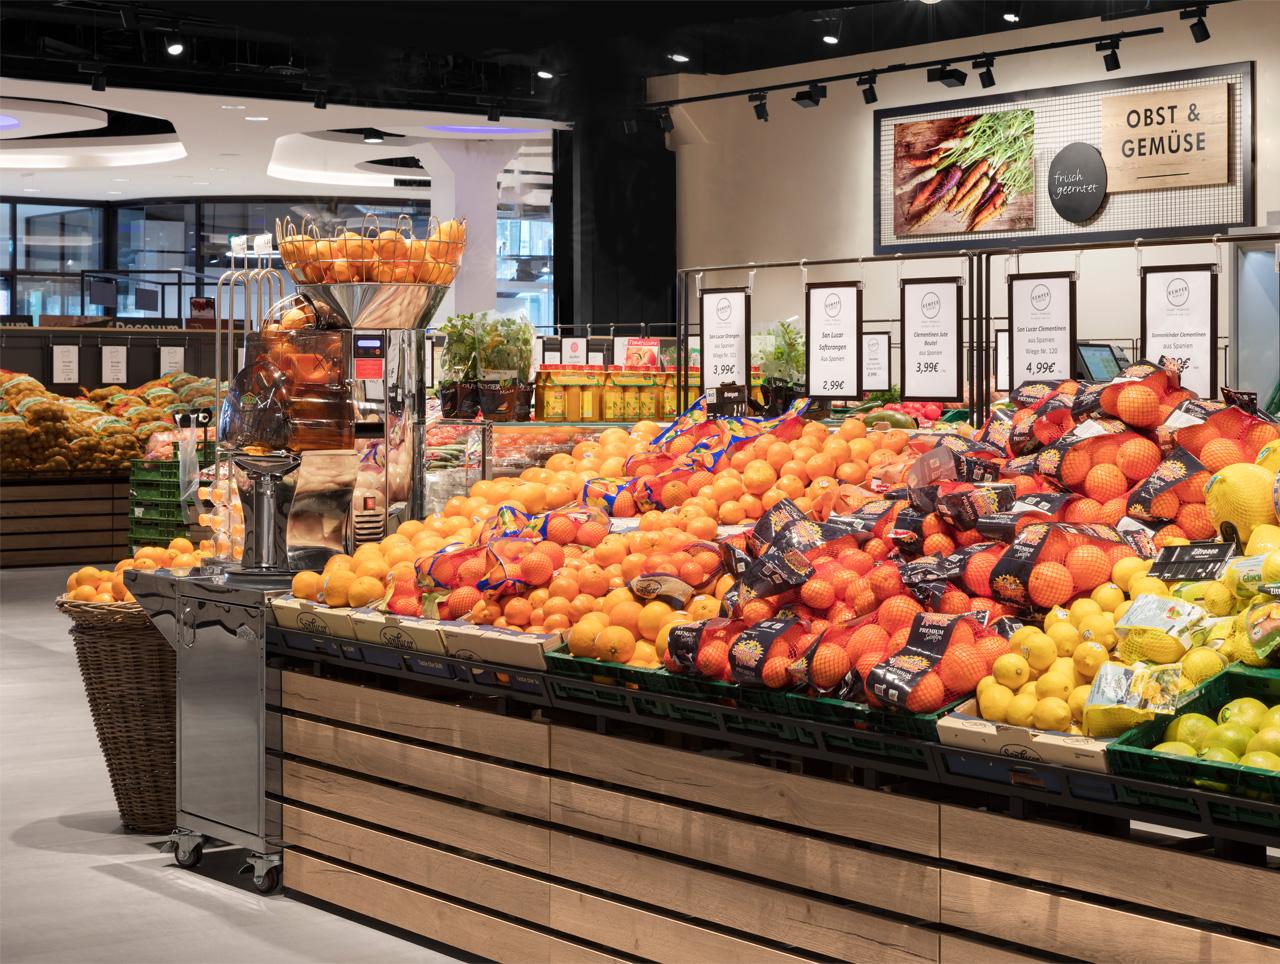 Neuer Edeka Kempermarkt in Ahlen/Westfalen | stores+shops